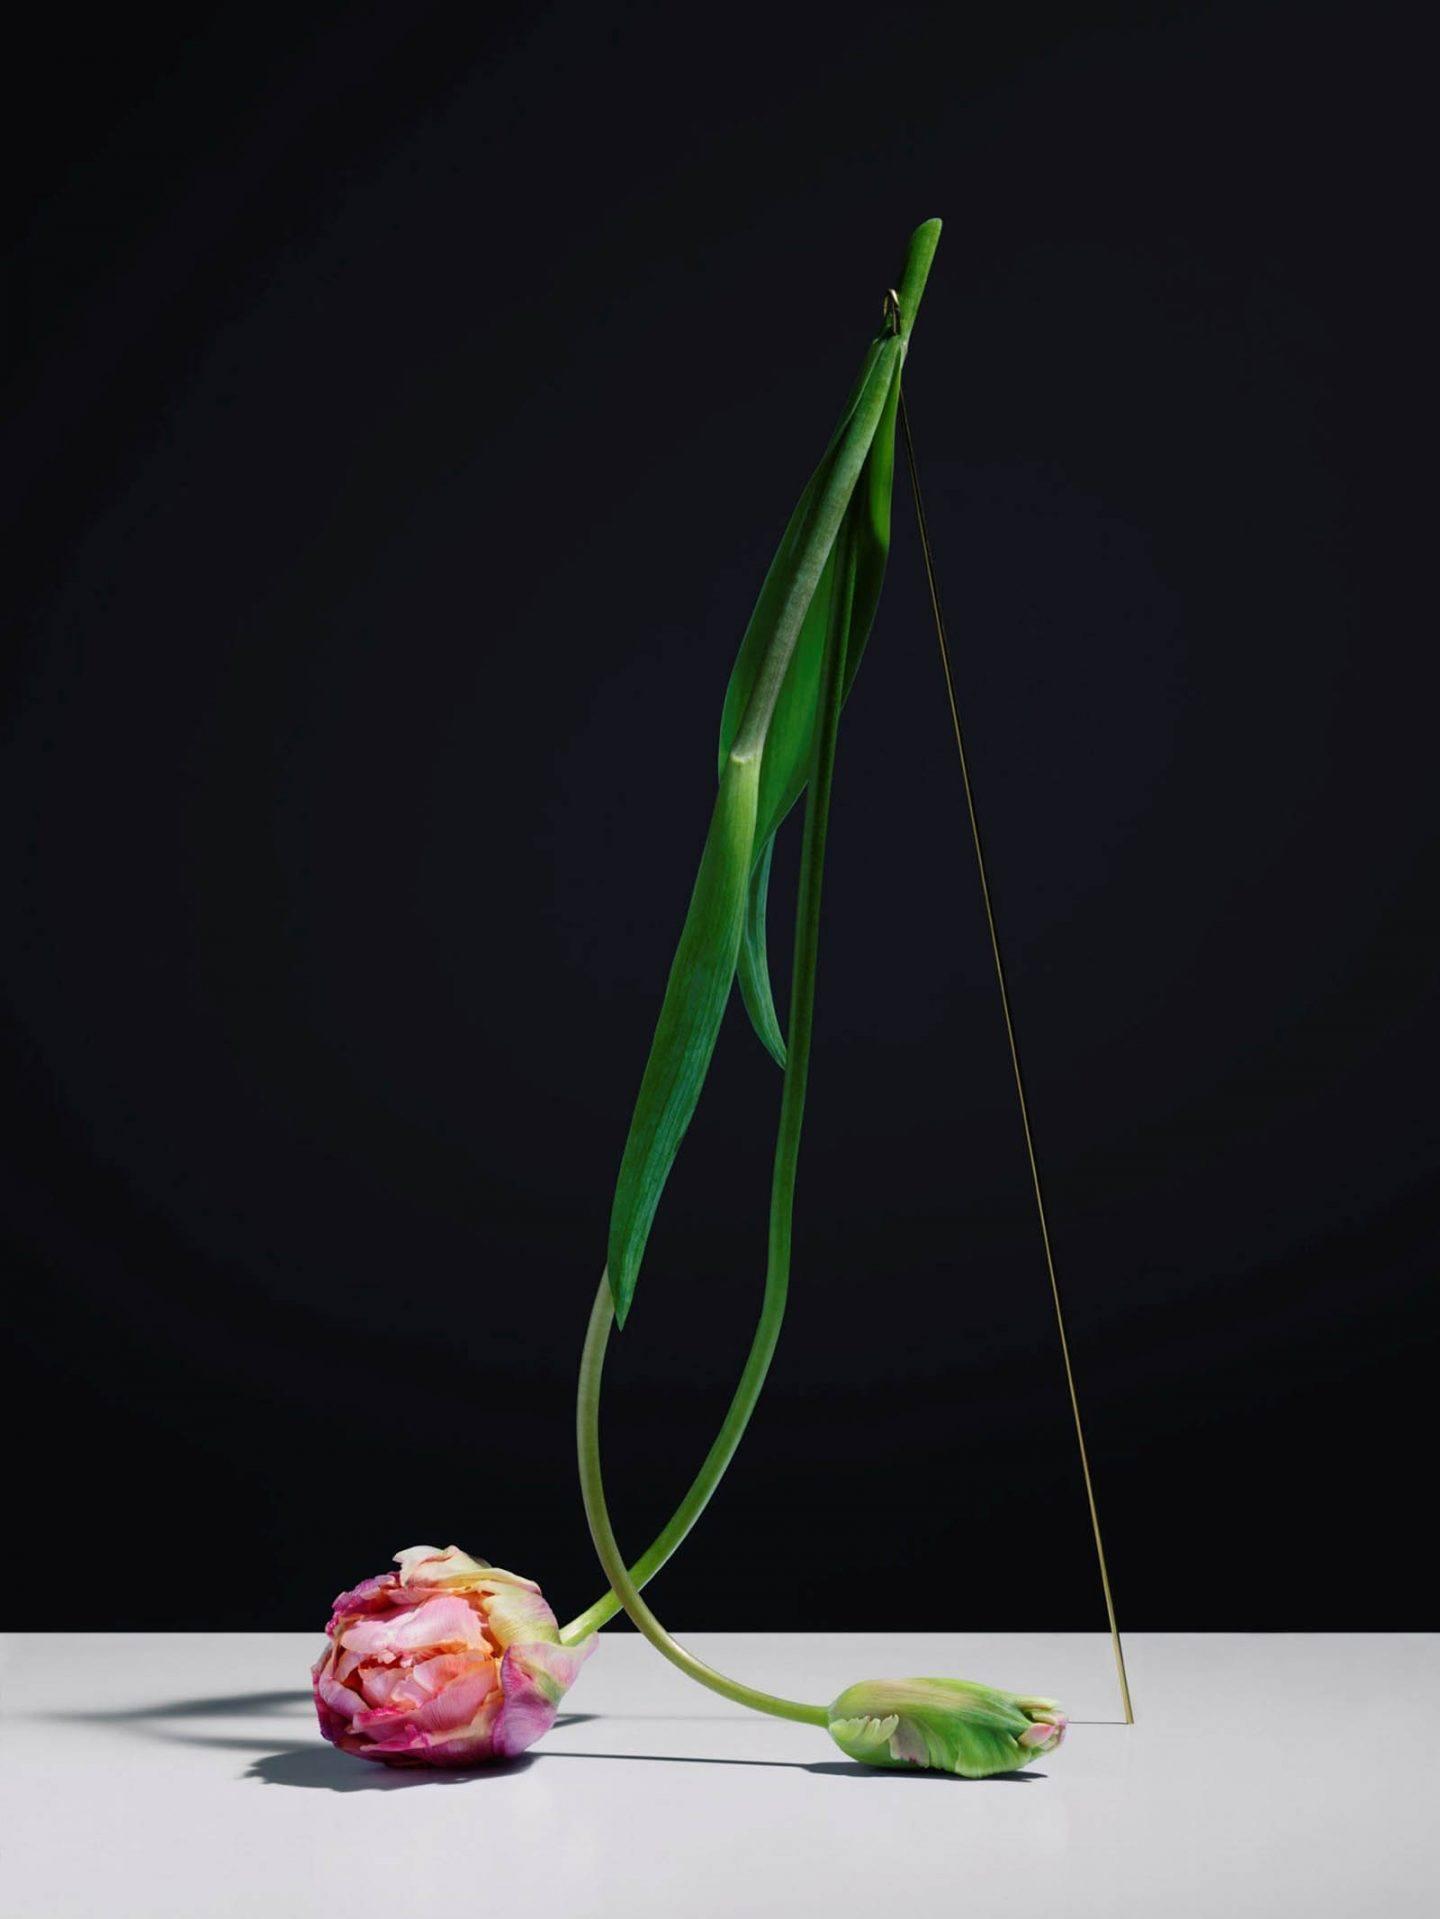 iGNANT-Art-Carl-Kleiner-Postures-006